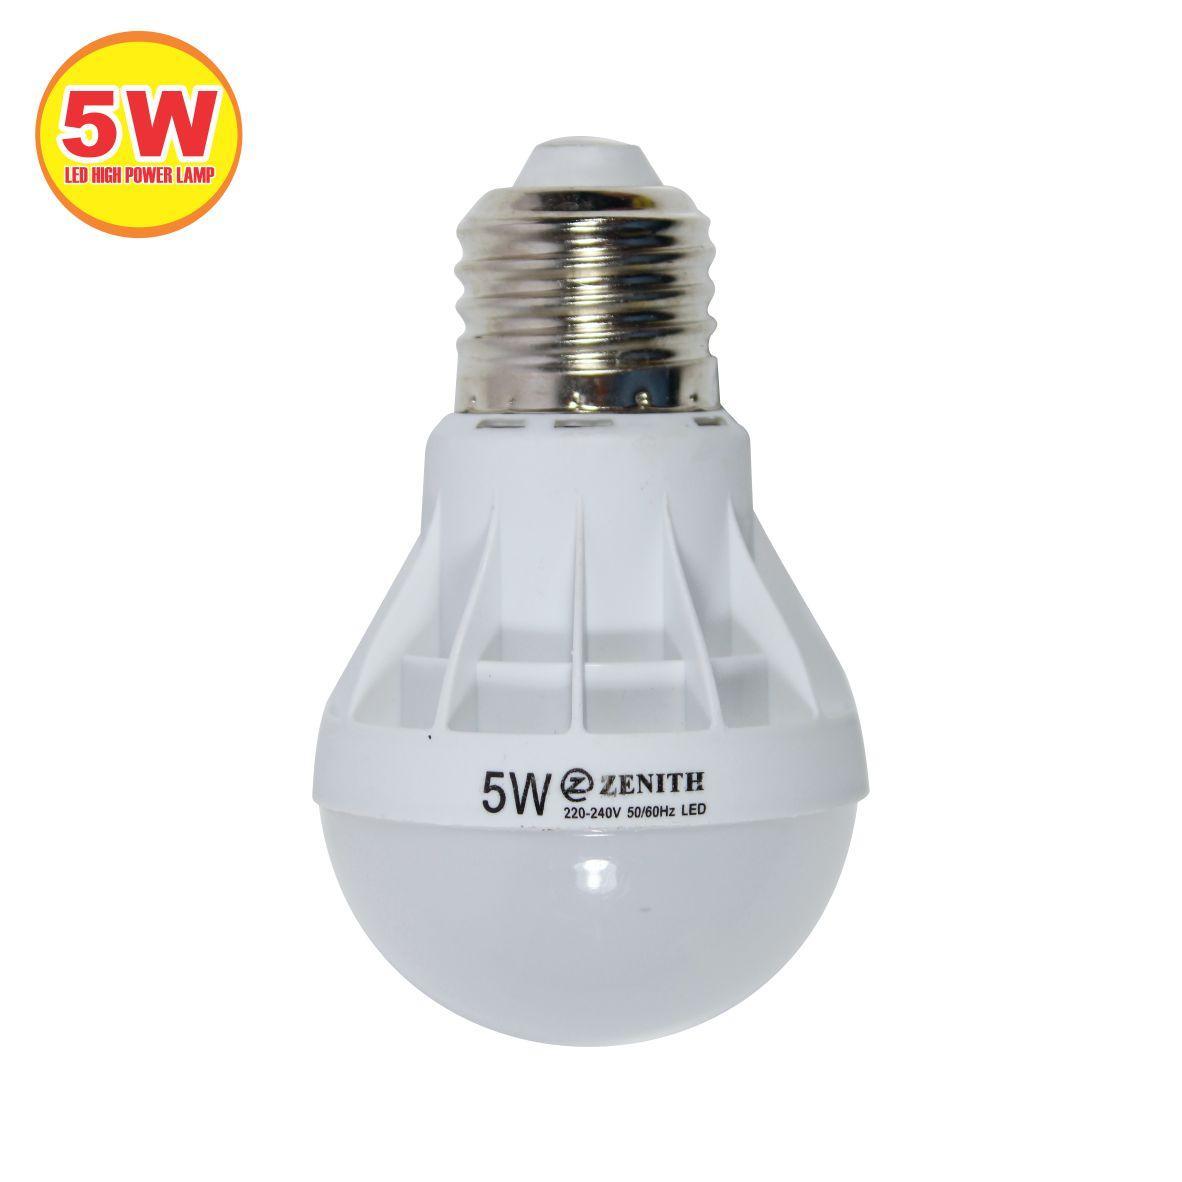 WEITECH LAMPU BOHLAM LED ZENITH HEMAT ENERGI DAN AWET 5 WATT